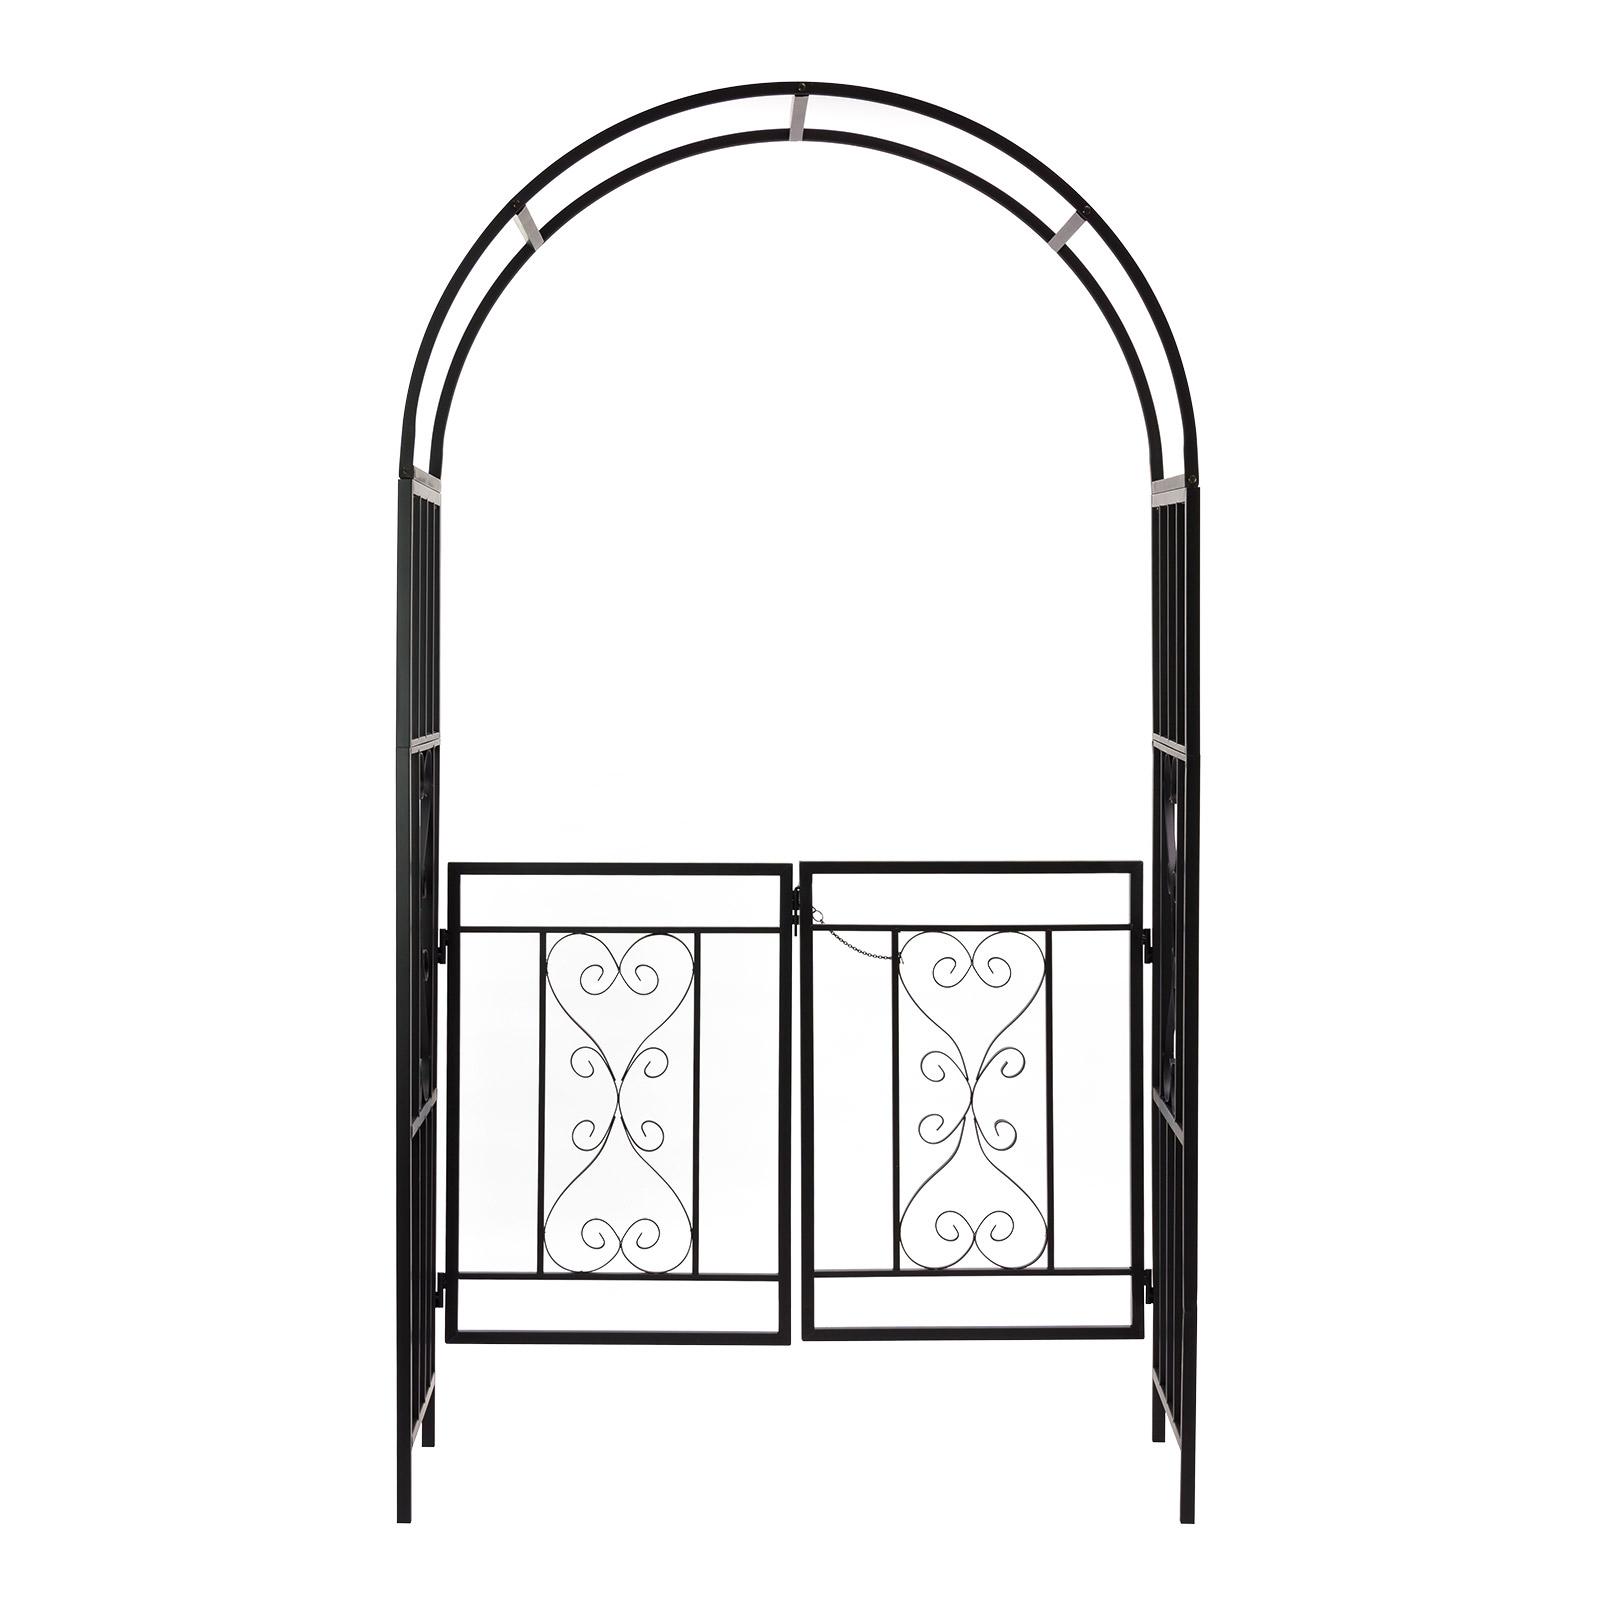 metall rosenbogen dover pergola rankhilfe rankgitter. Black Bedroom Furniture Sets. Home Design Ideas